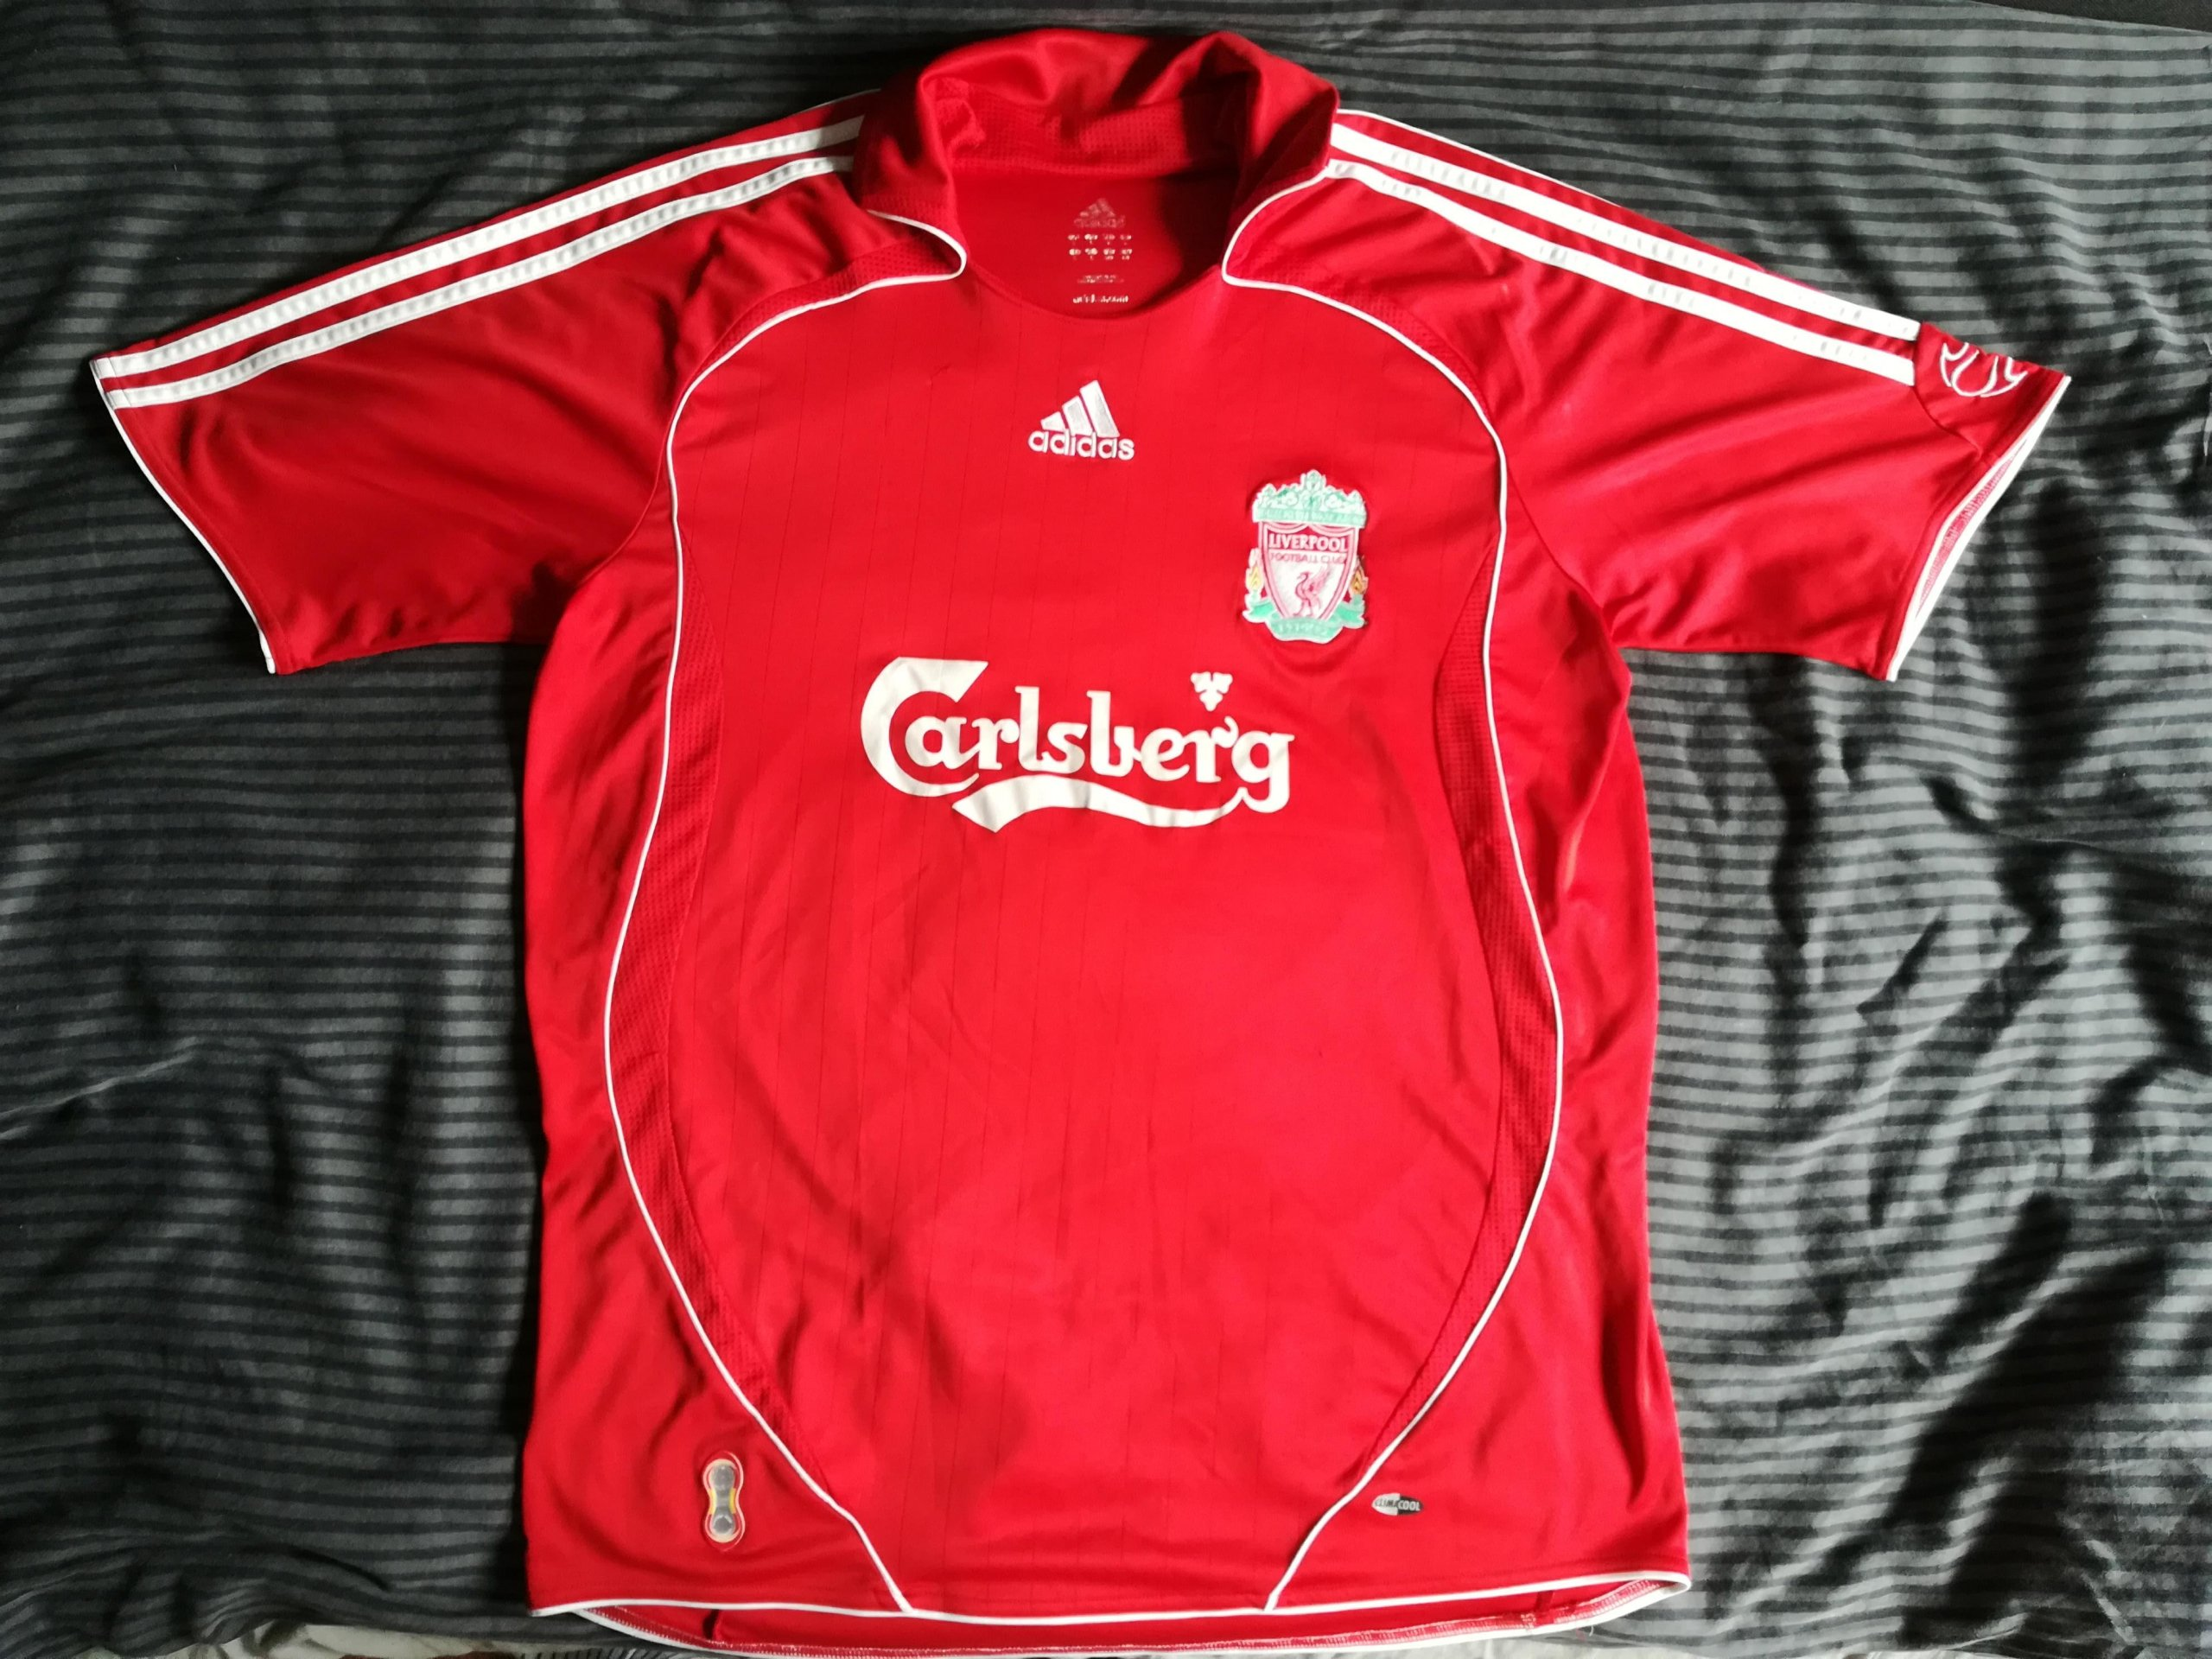 sale retailer cd3e7 d5da6 Koszulka Liverpool 06/07 L